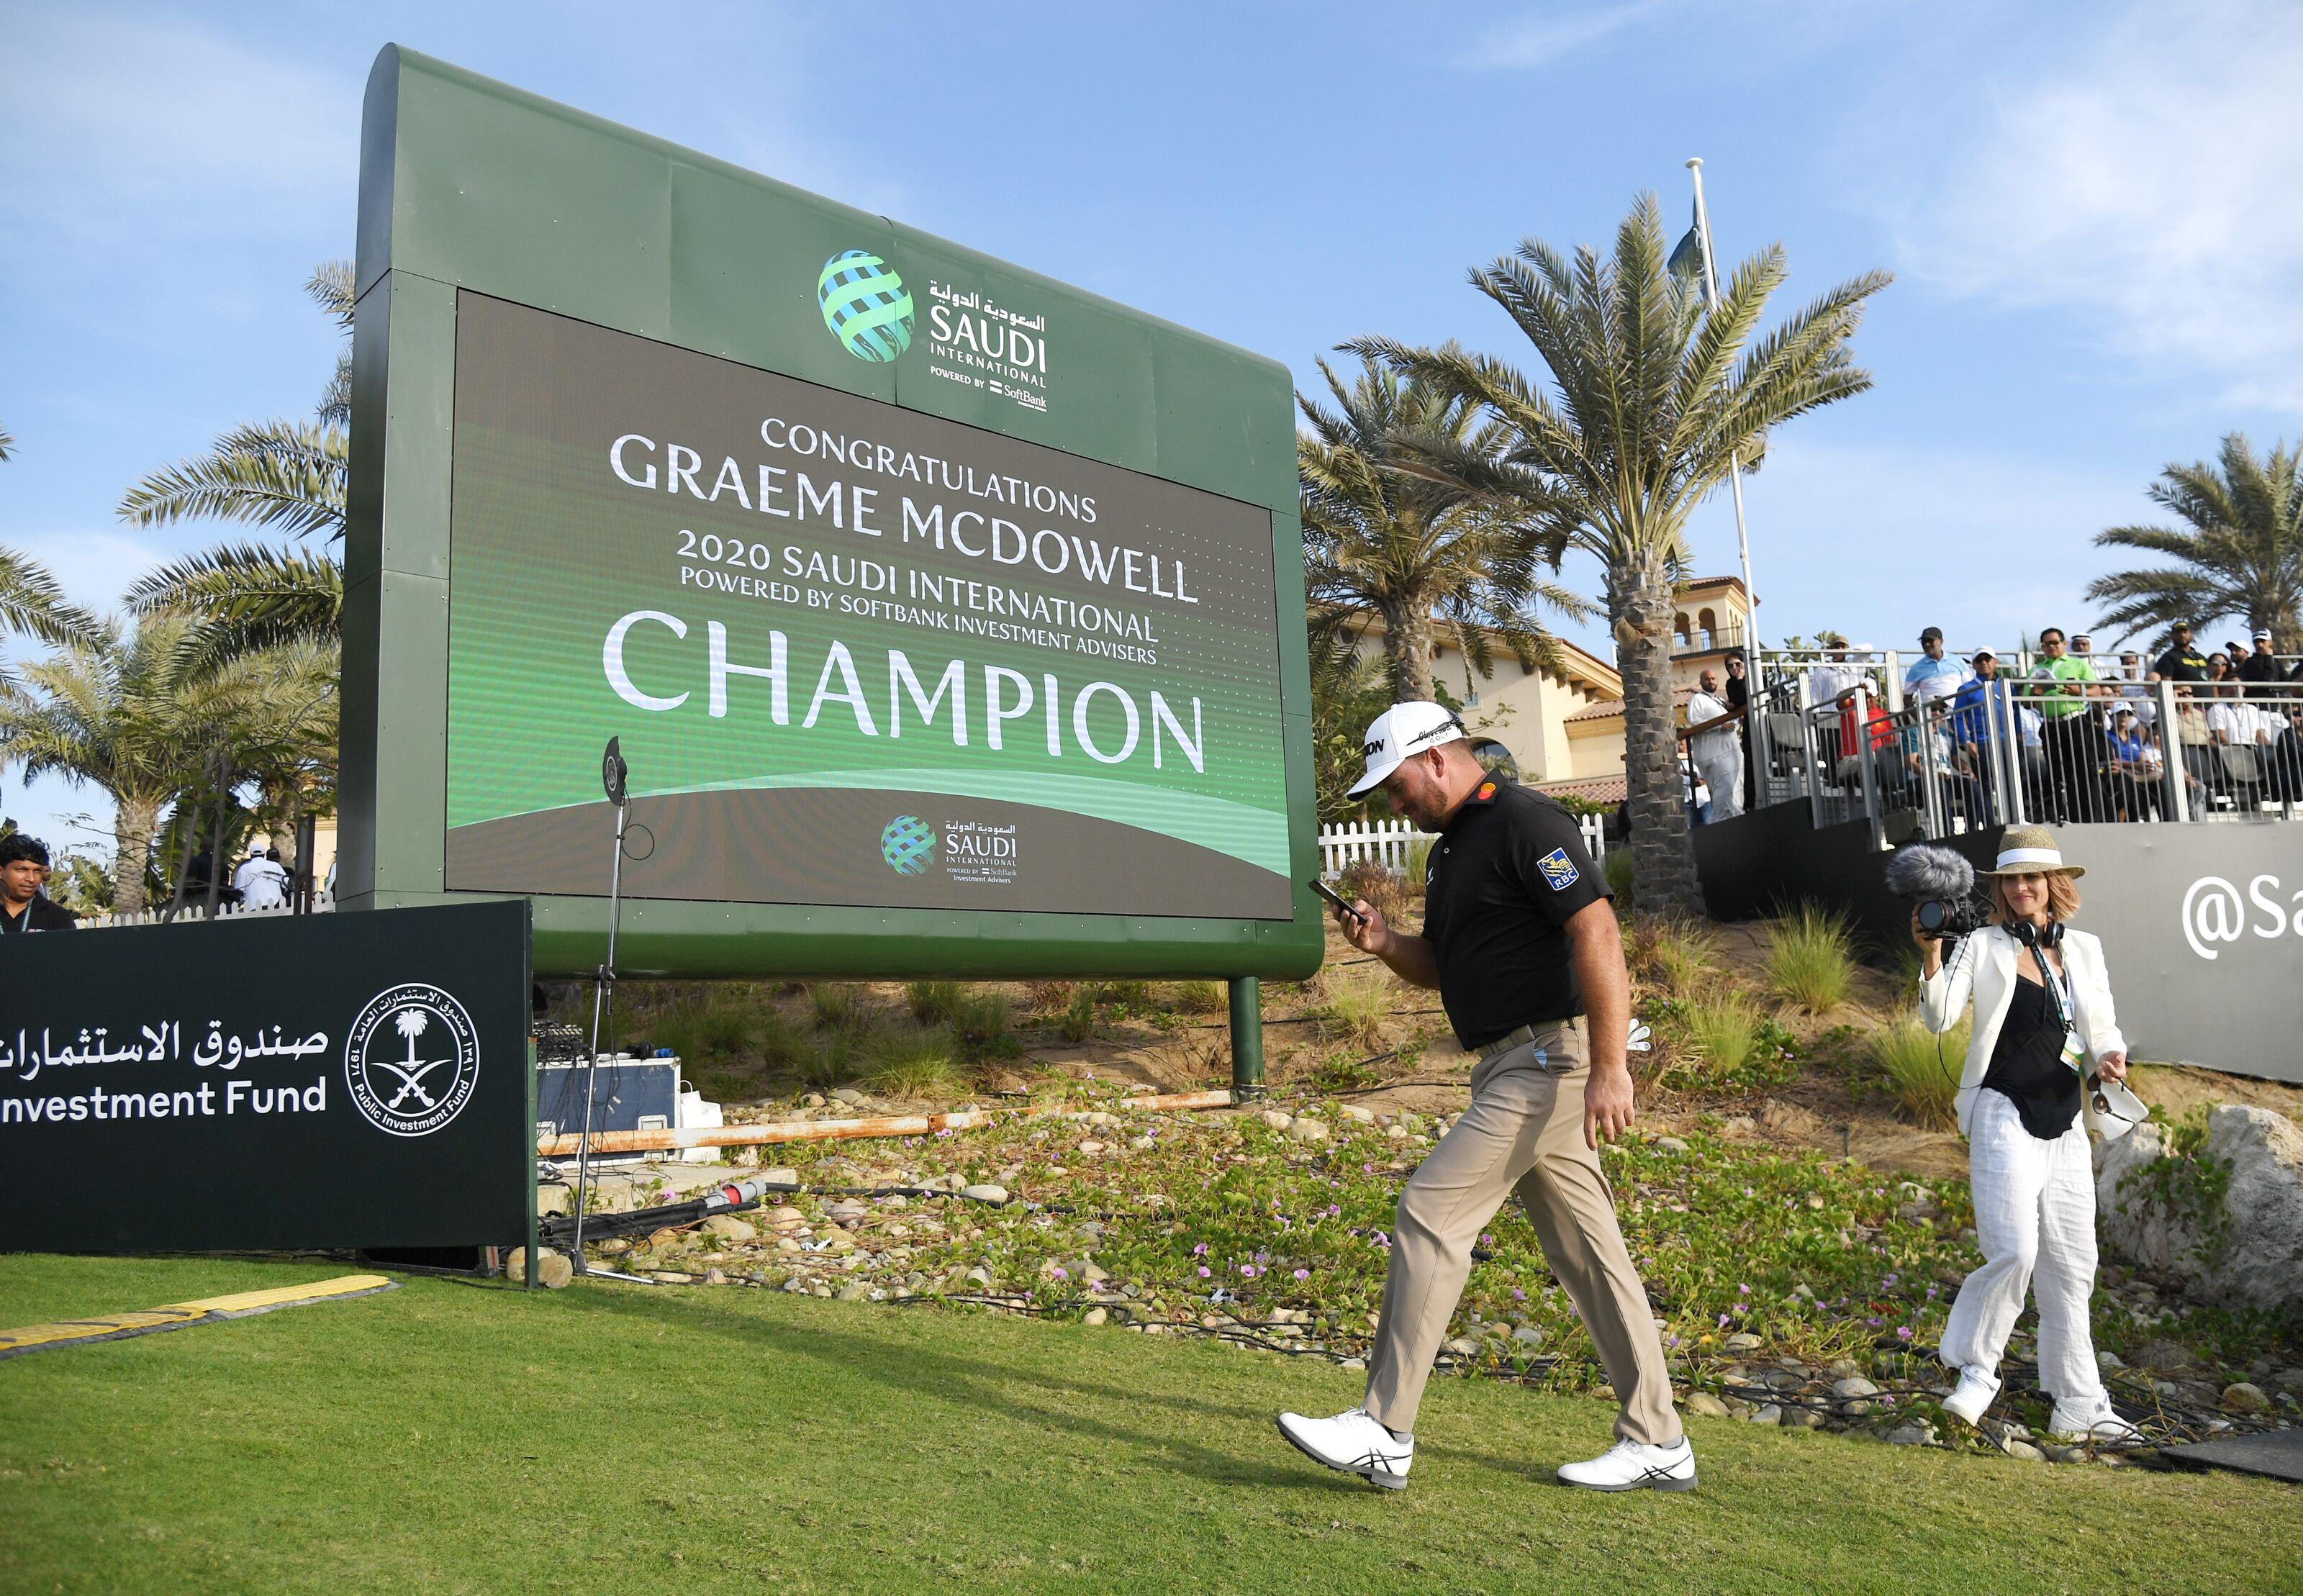 Race to Dubai: Graeme McDowell Into Top Three After Saudi Win